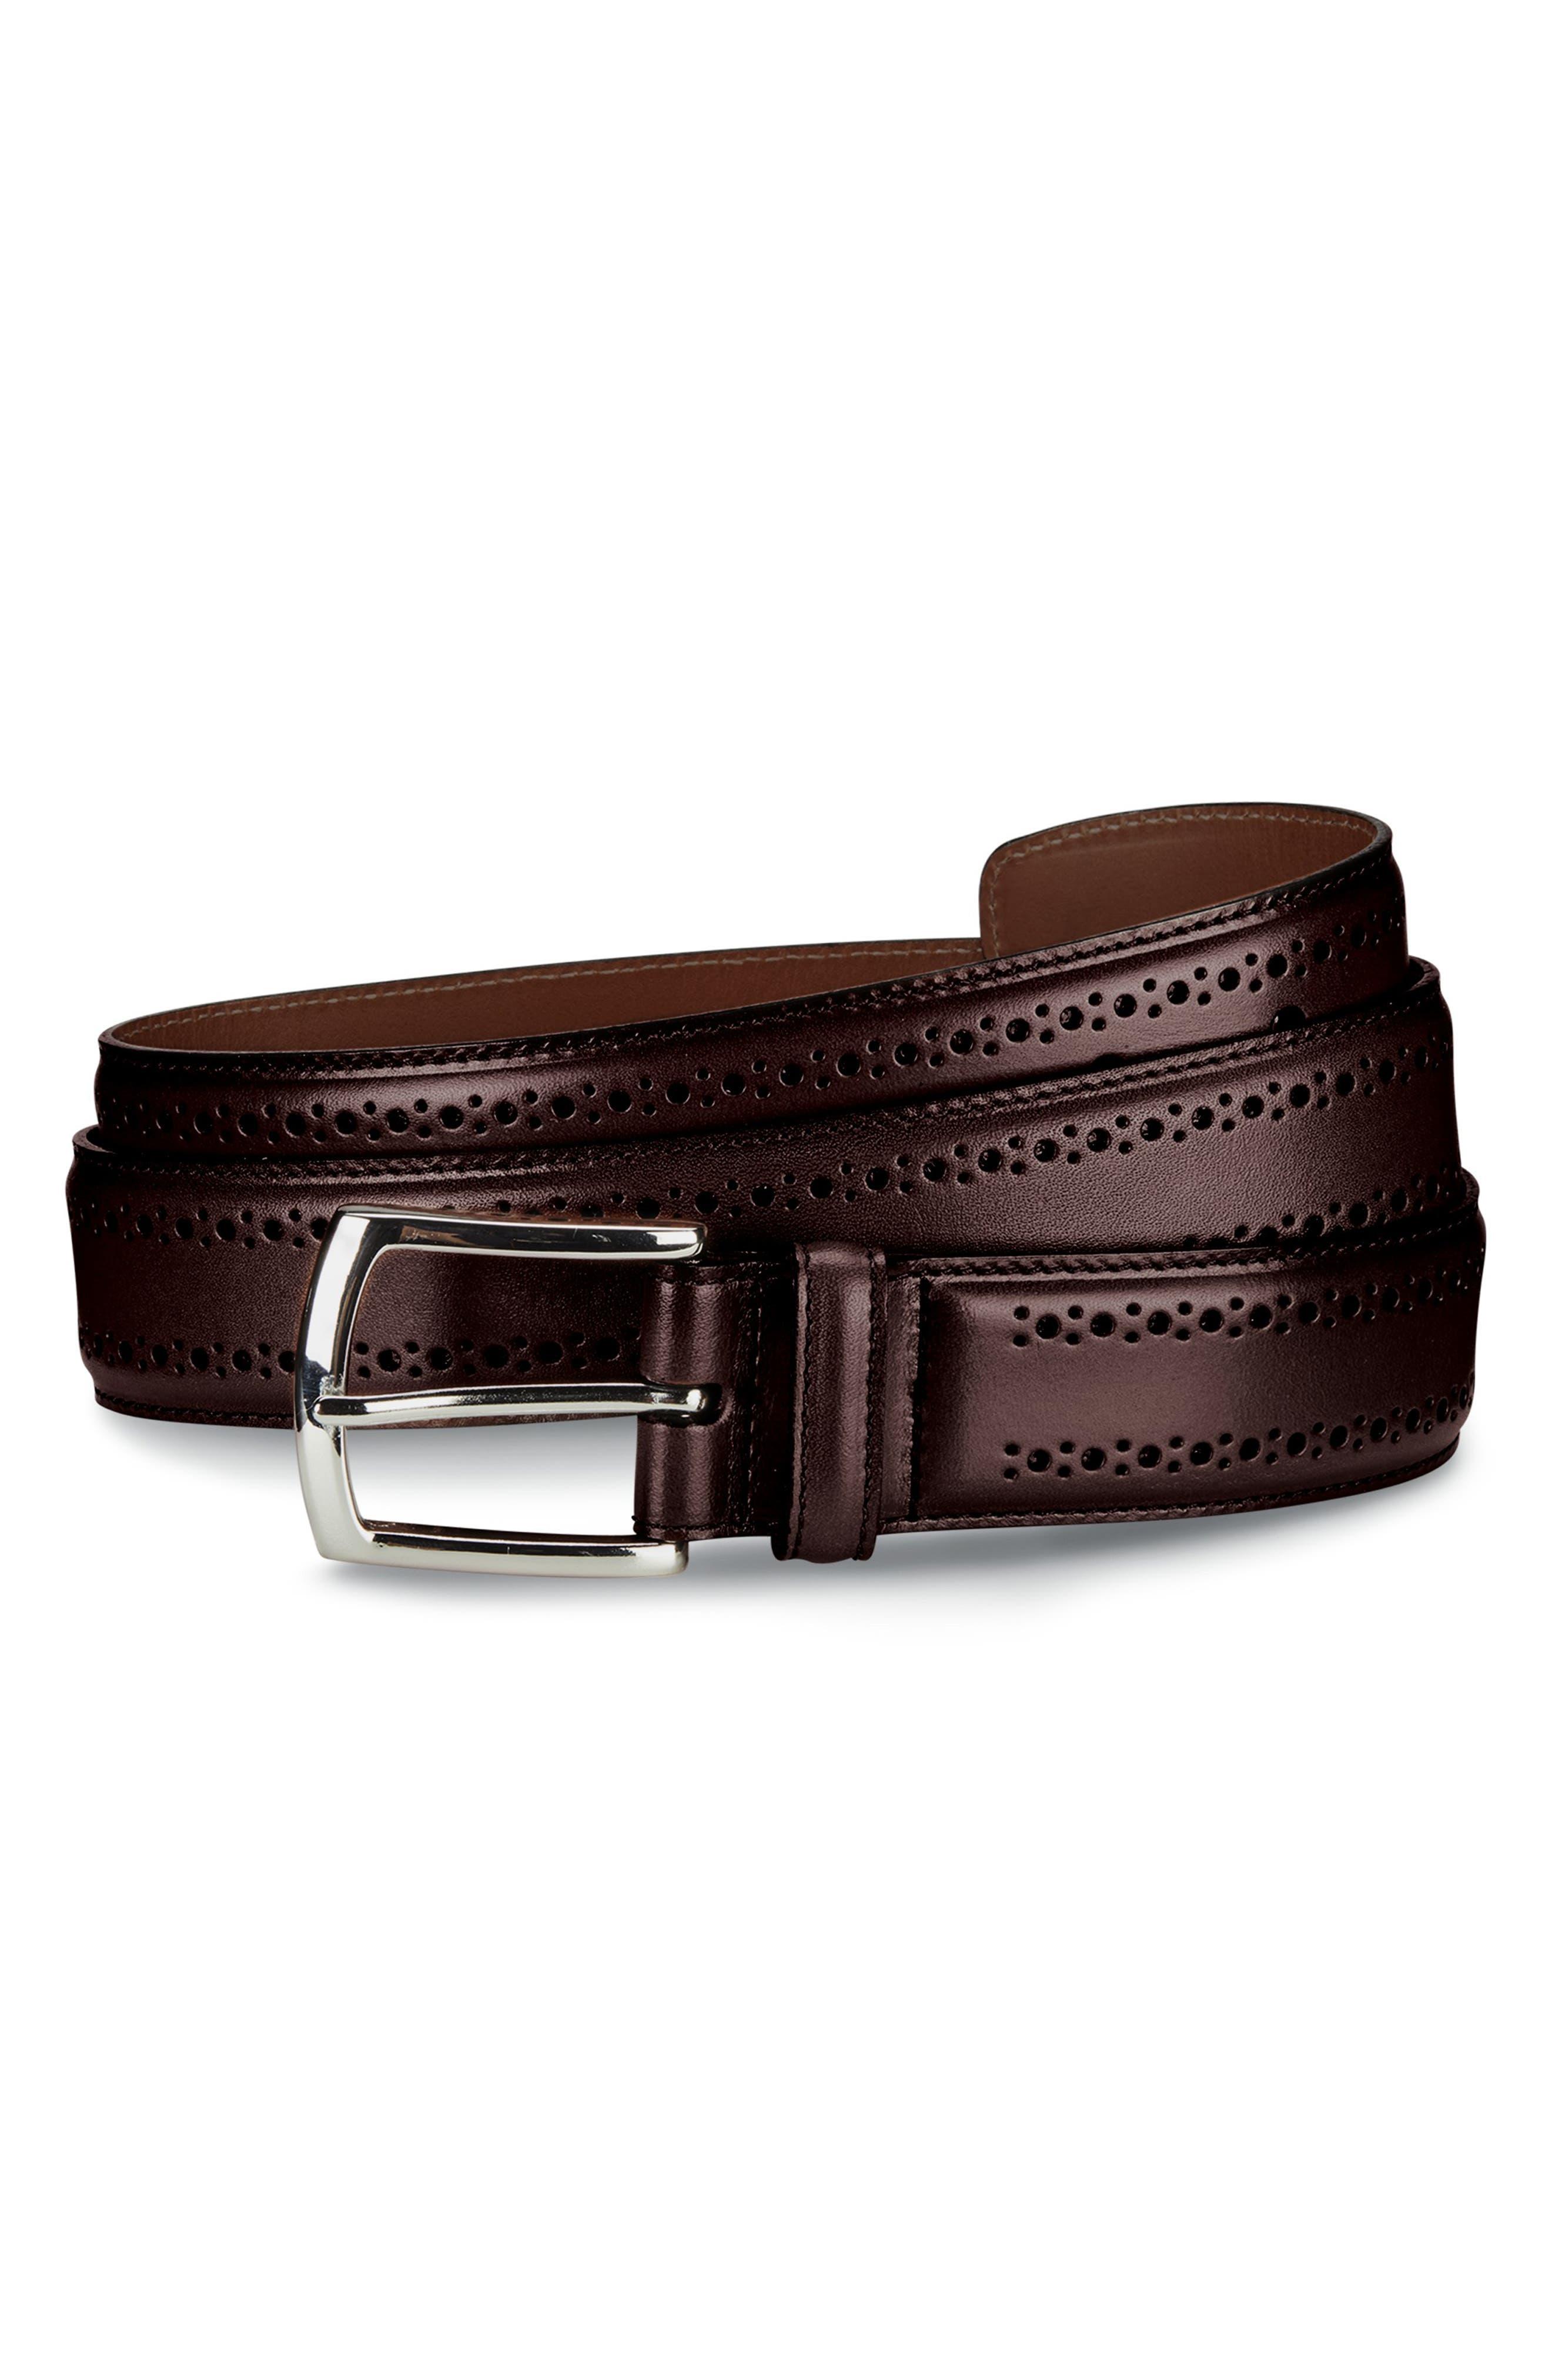 Manistee Brogued Leather Belt